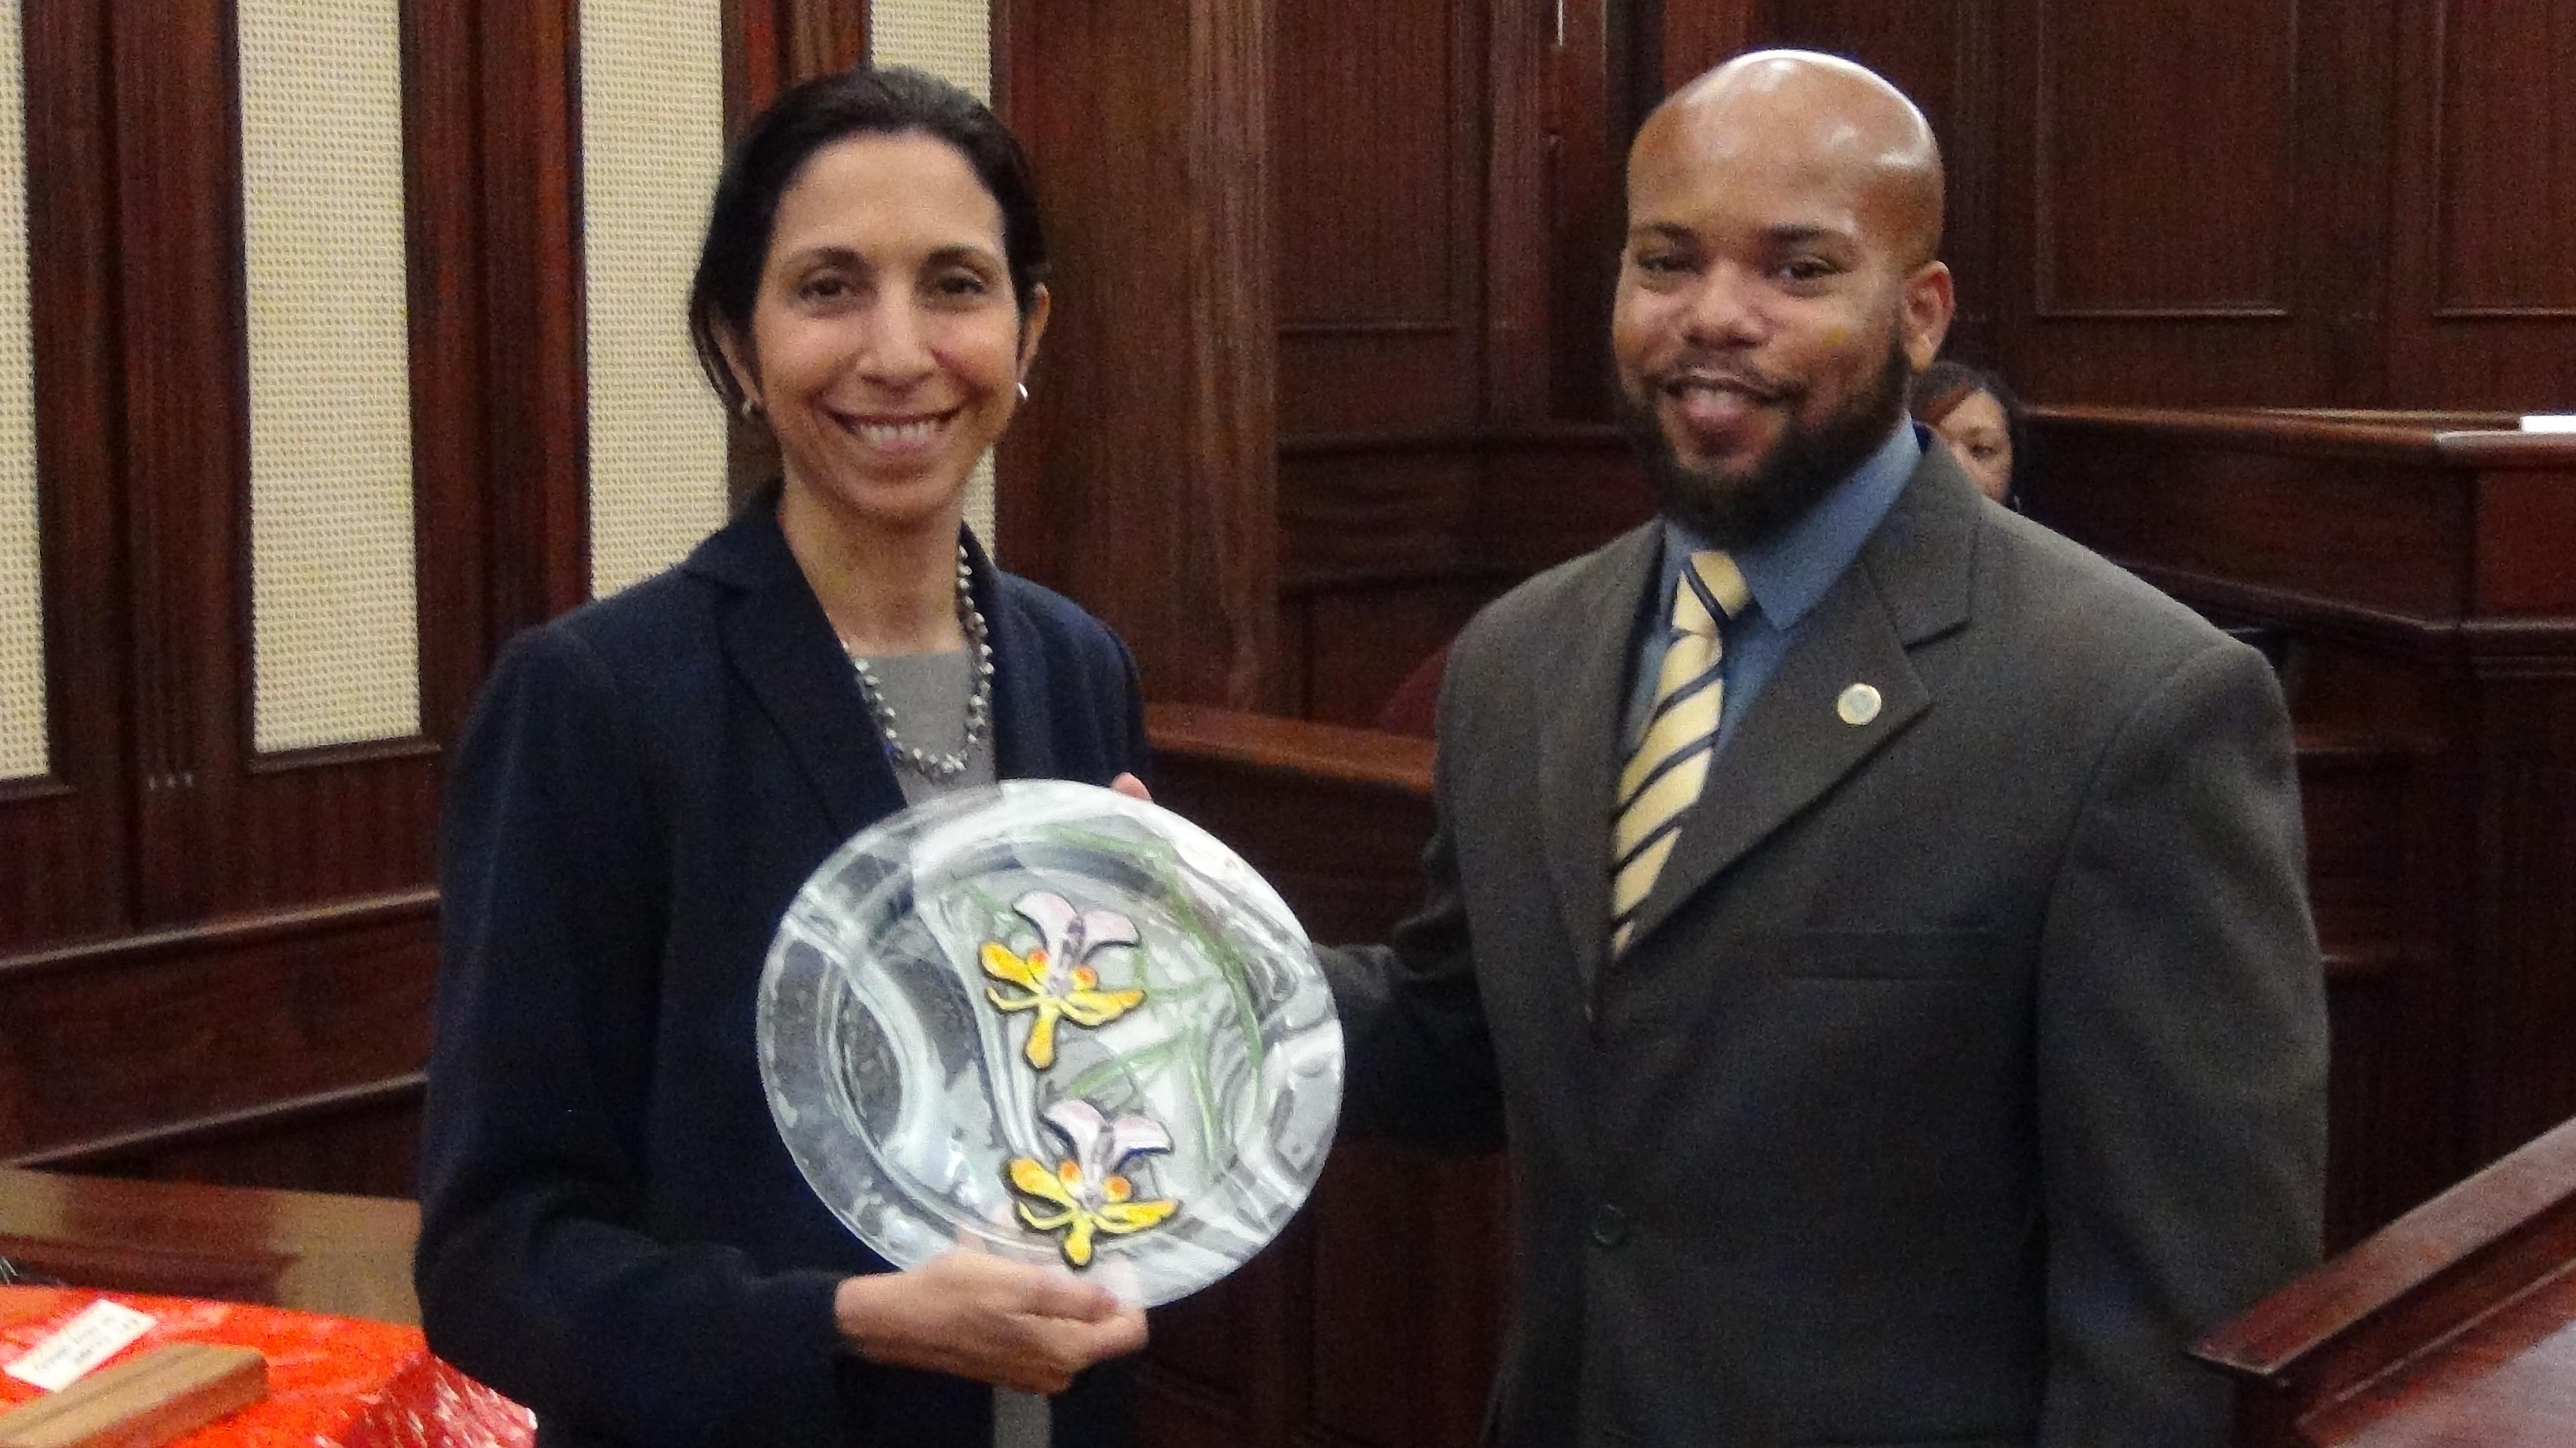 Former Territorial Court judge Soraya Diase Coffelt and V.I. Bar Association president Earnest Morris Jr.